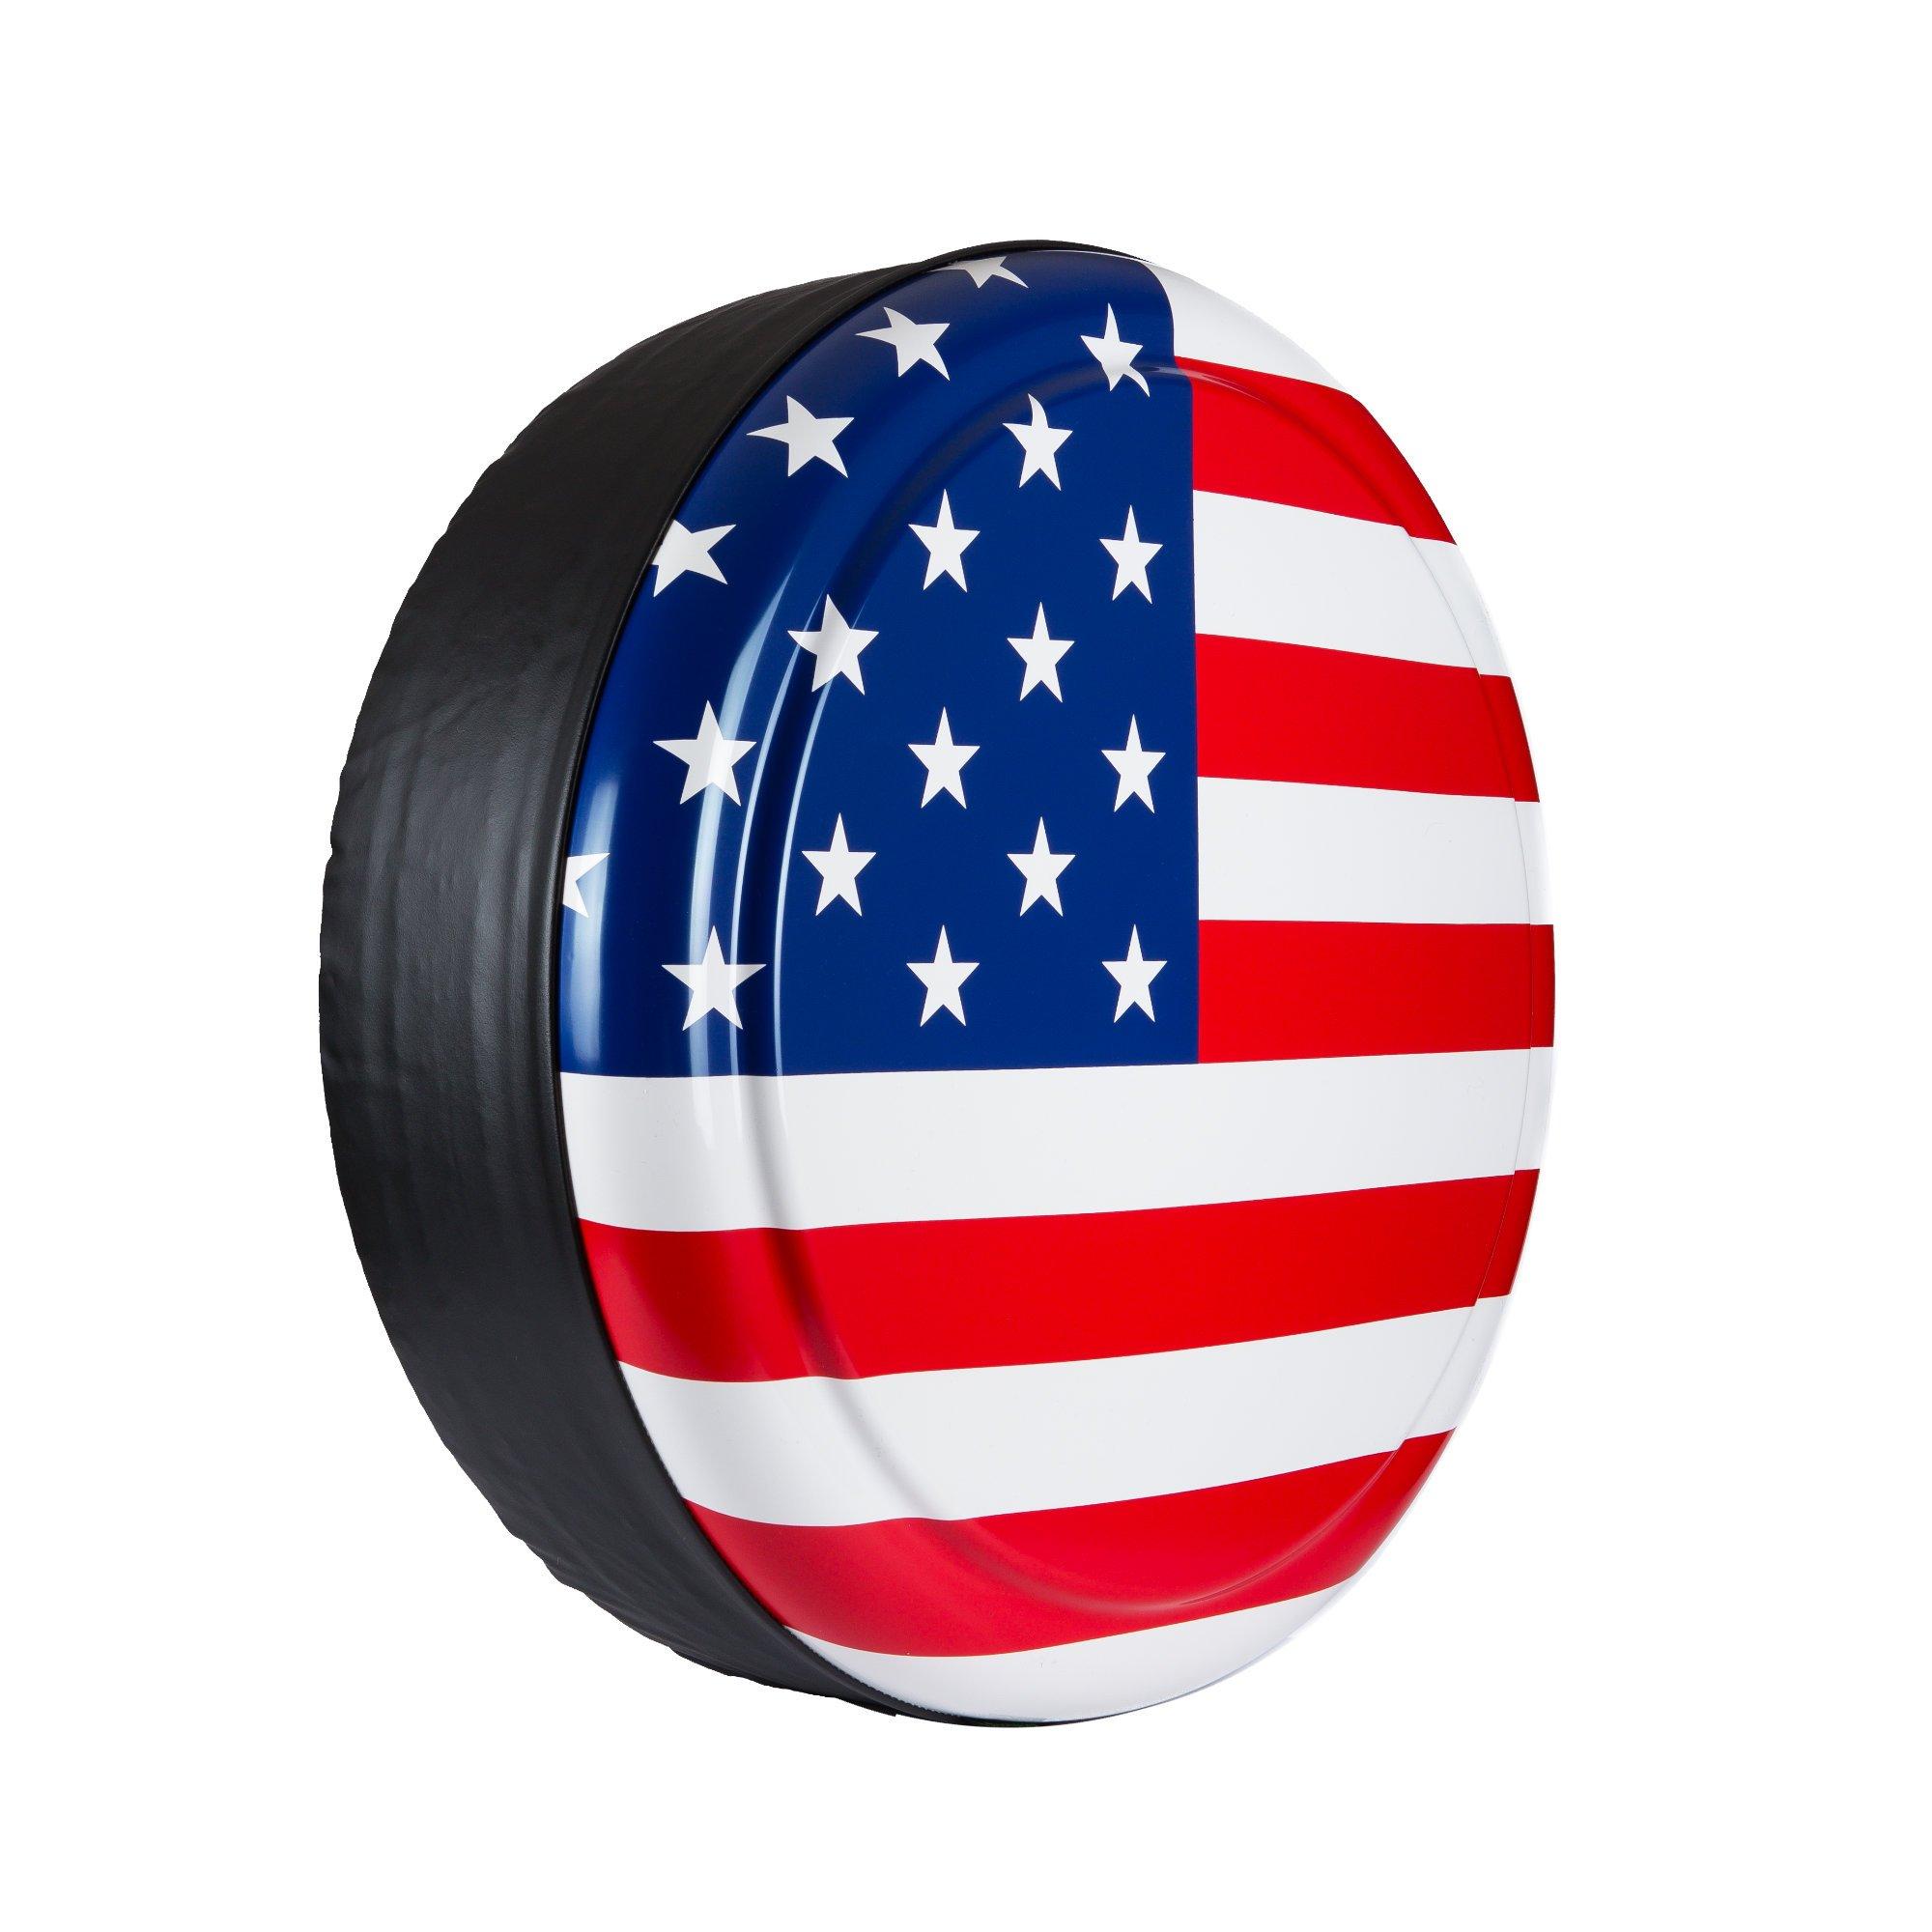 35'' Rigid Tire Cover - (Hard Plastic Face & Vinyl Band) - American Flag